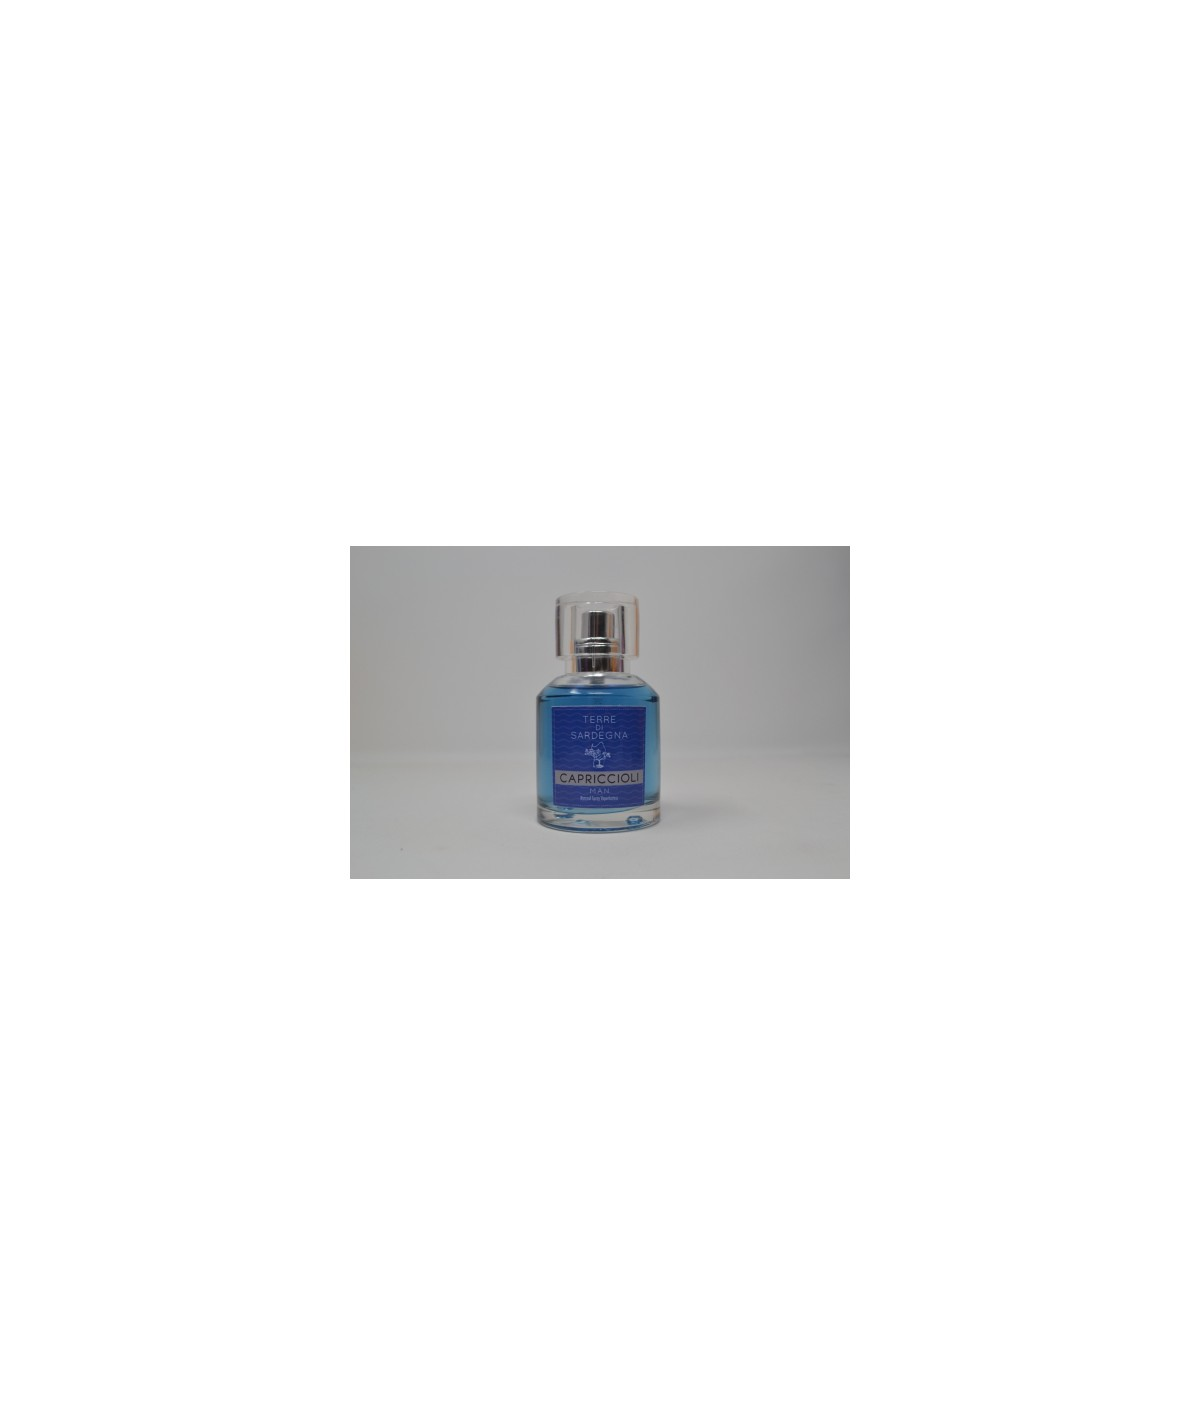 CAPRICCIOLI blu